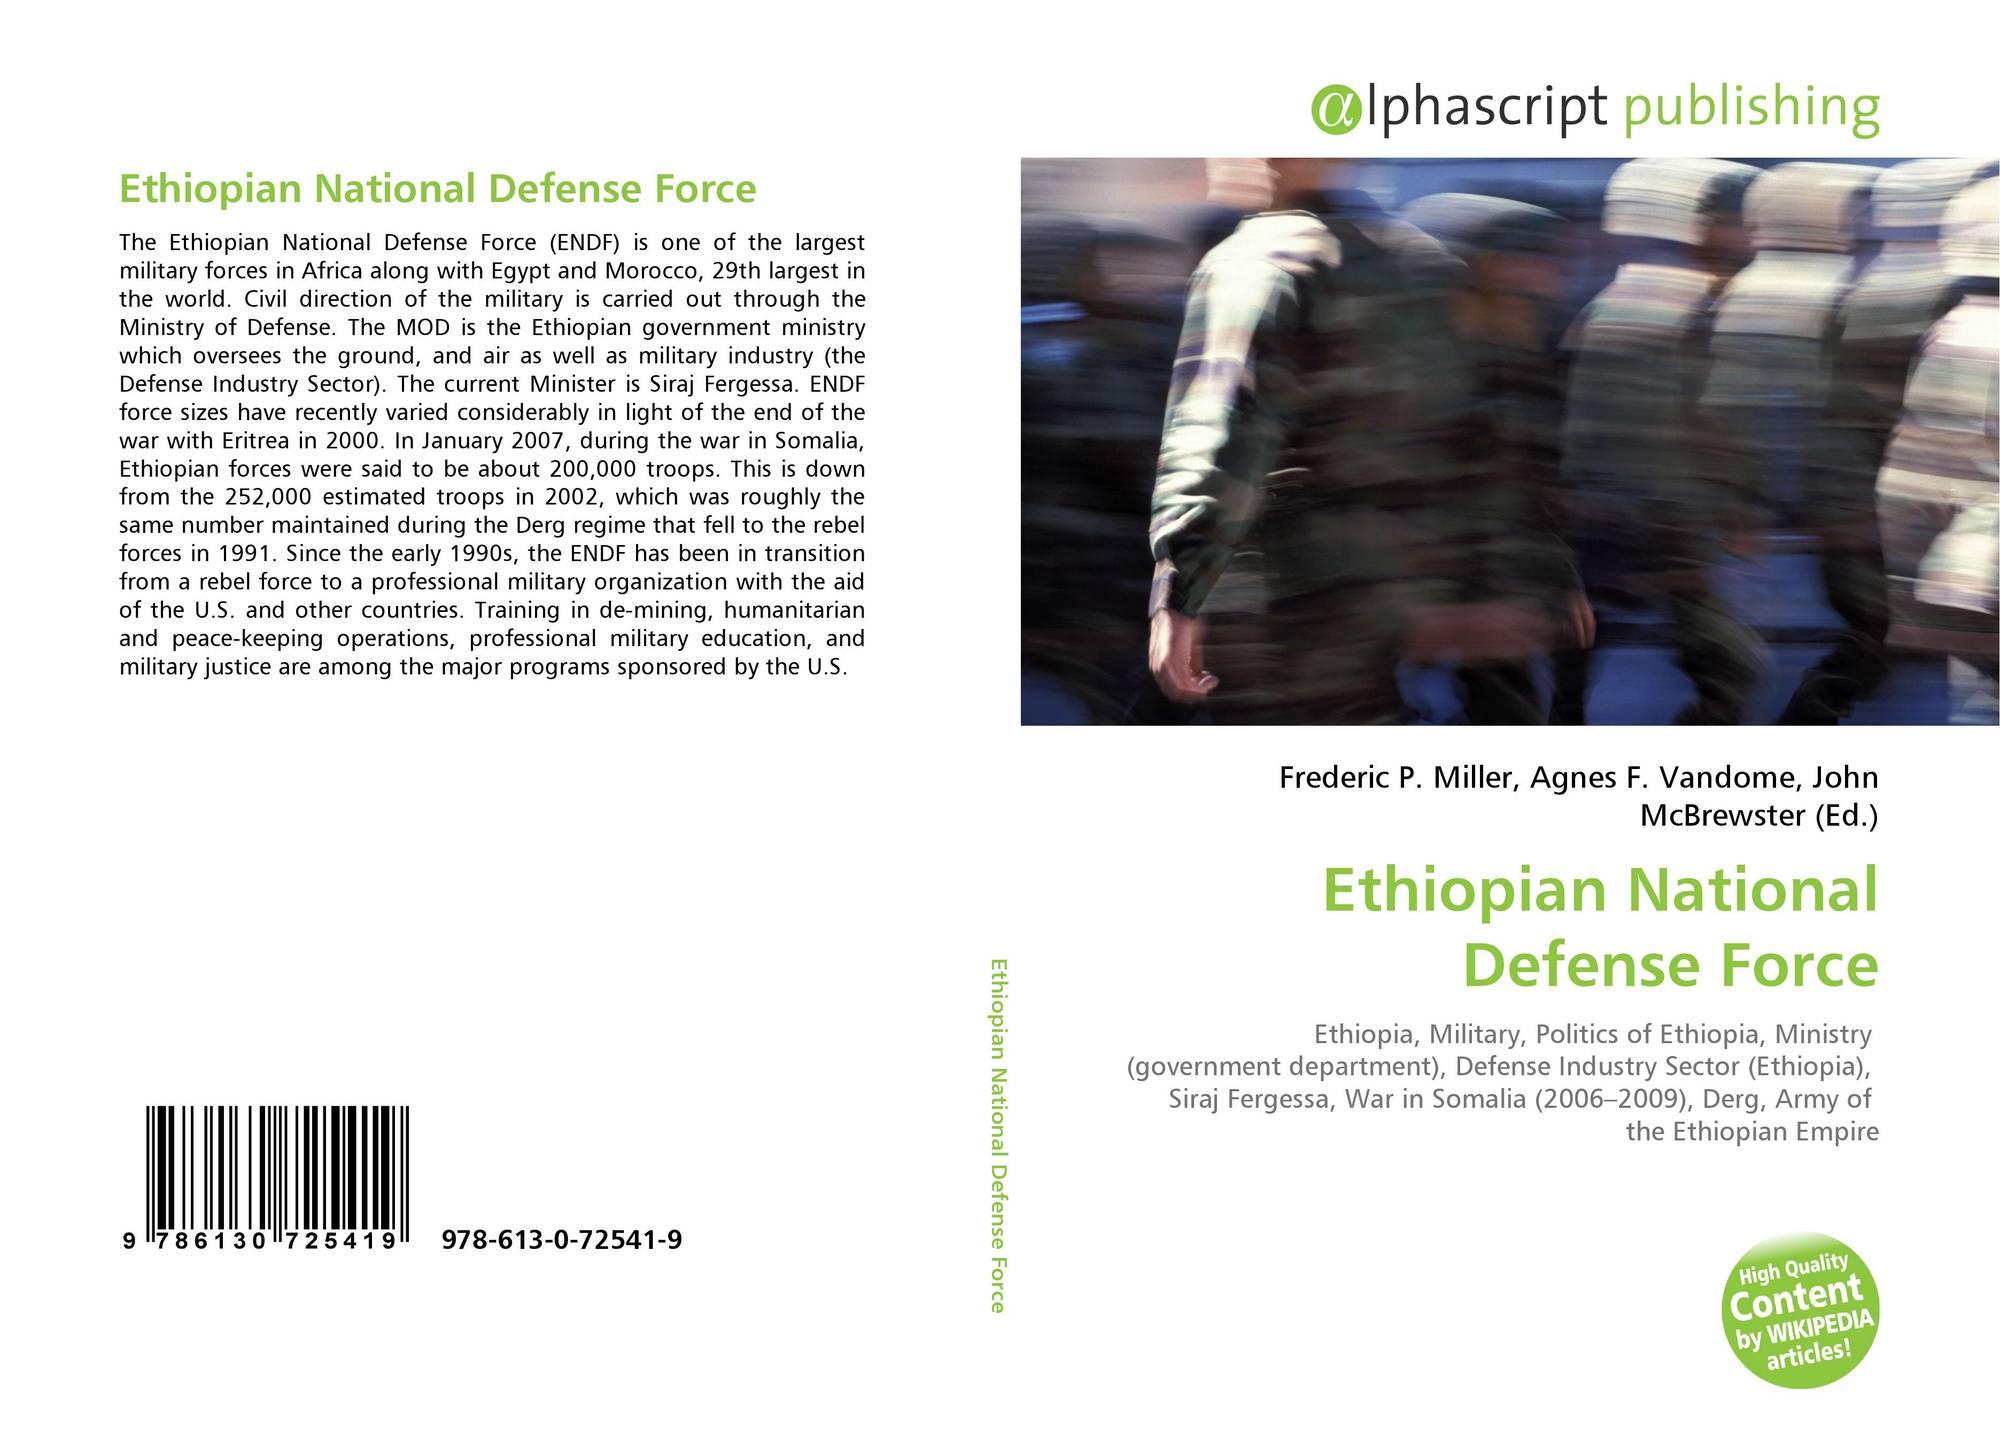 Ethiopian National Defense Force, 978-613-0-72541-9